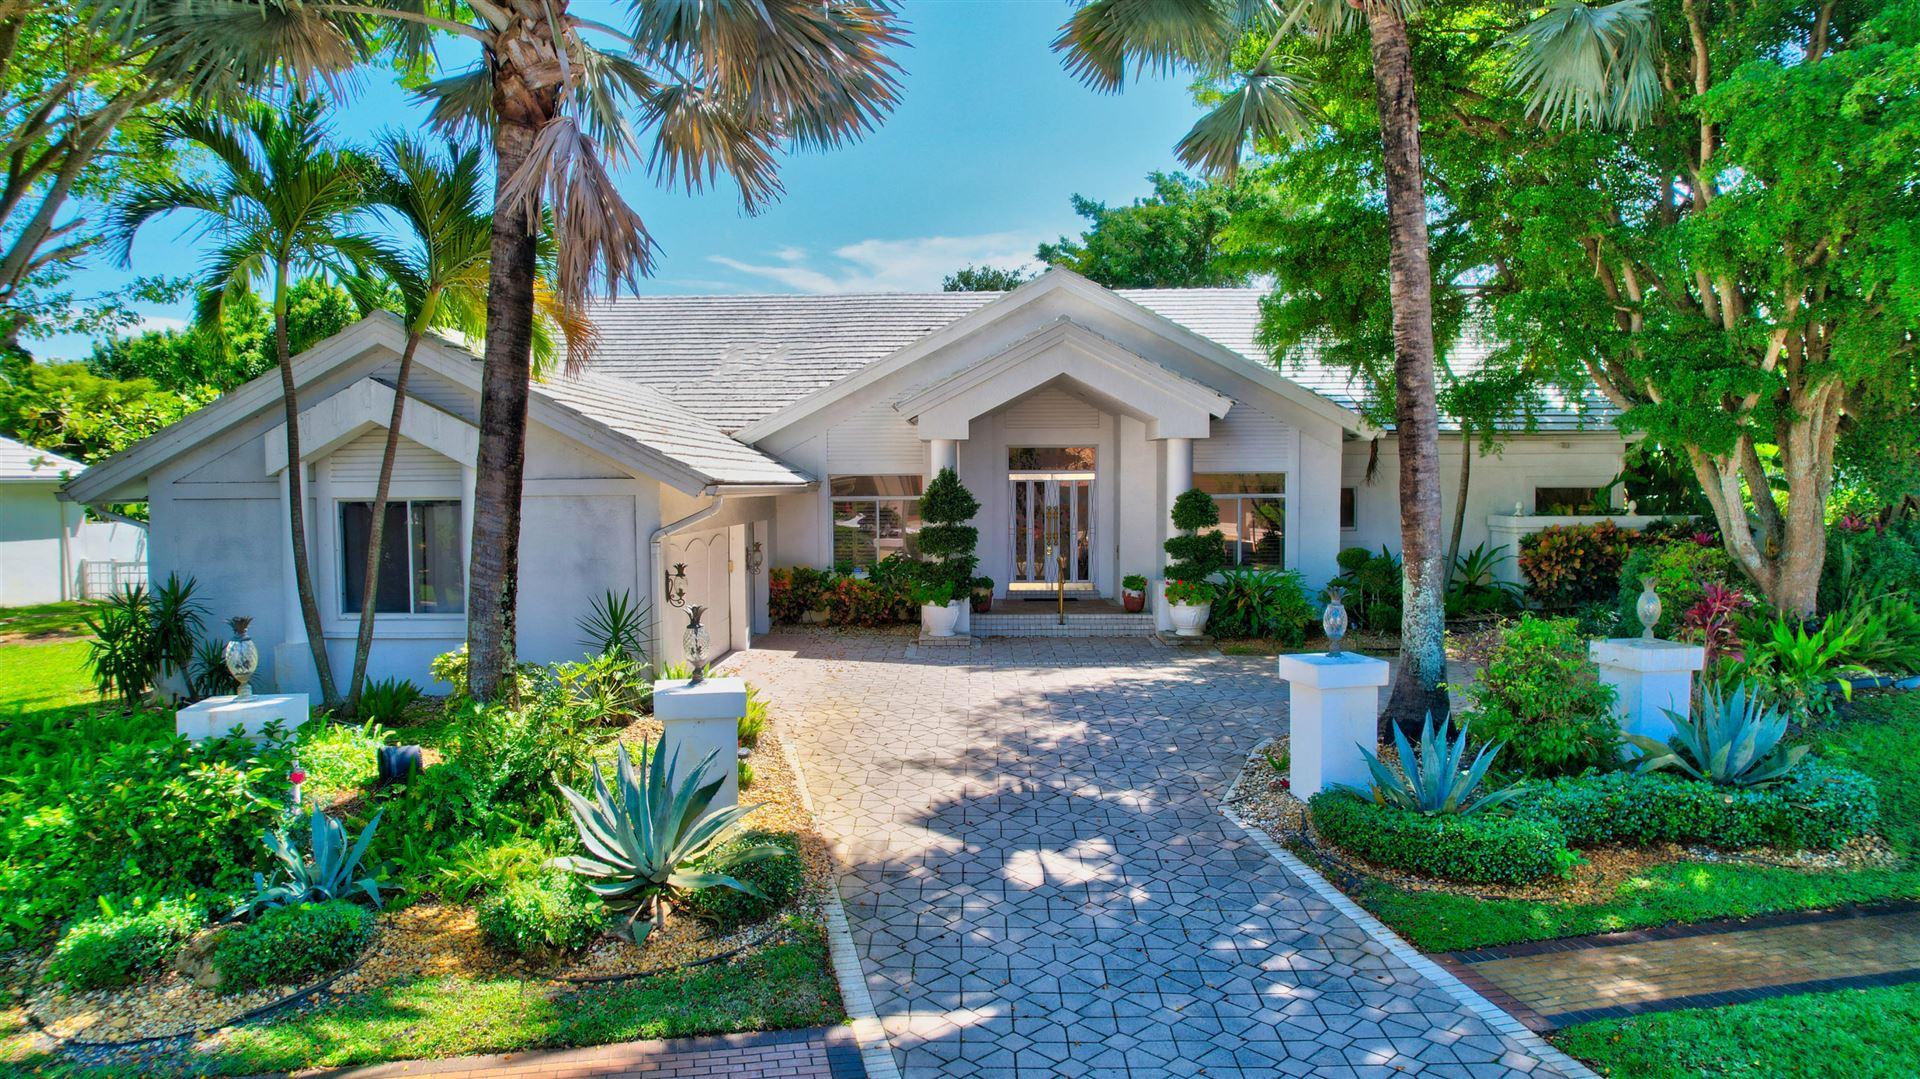 6924 Queenferry Circle, Boca Raton, FL 33496 - MLS#: RX-10715392